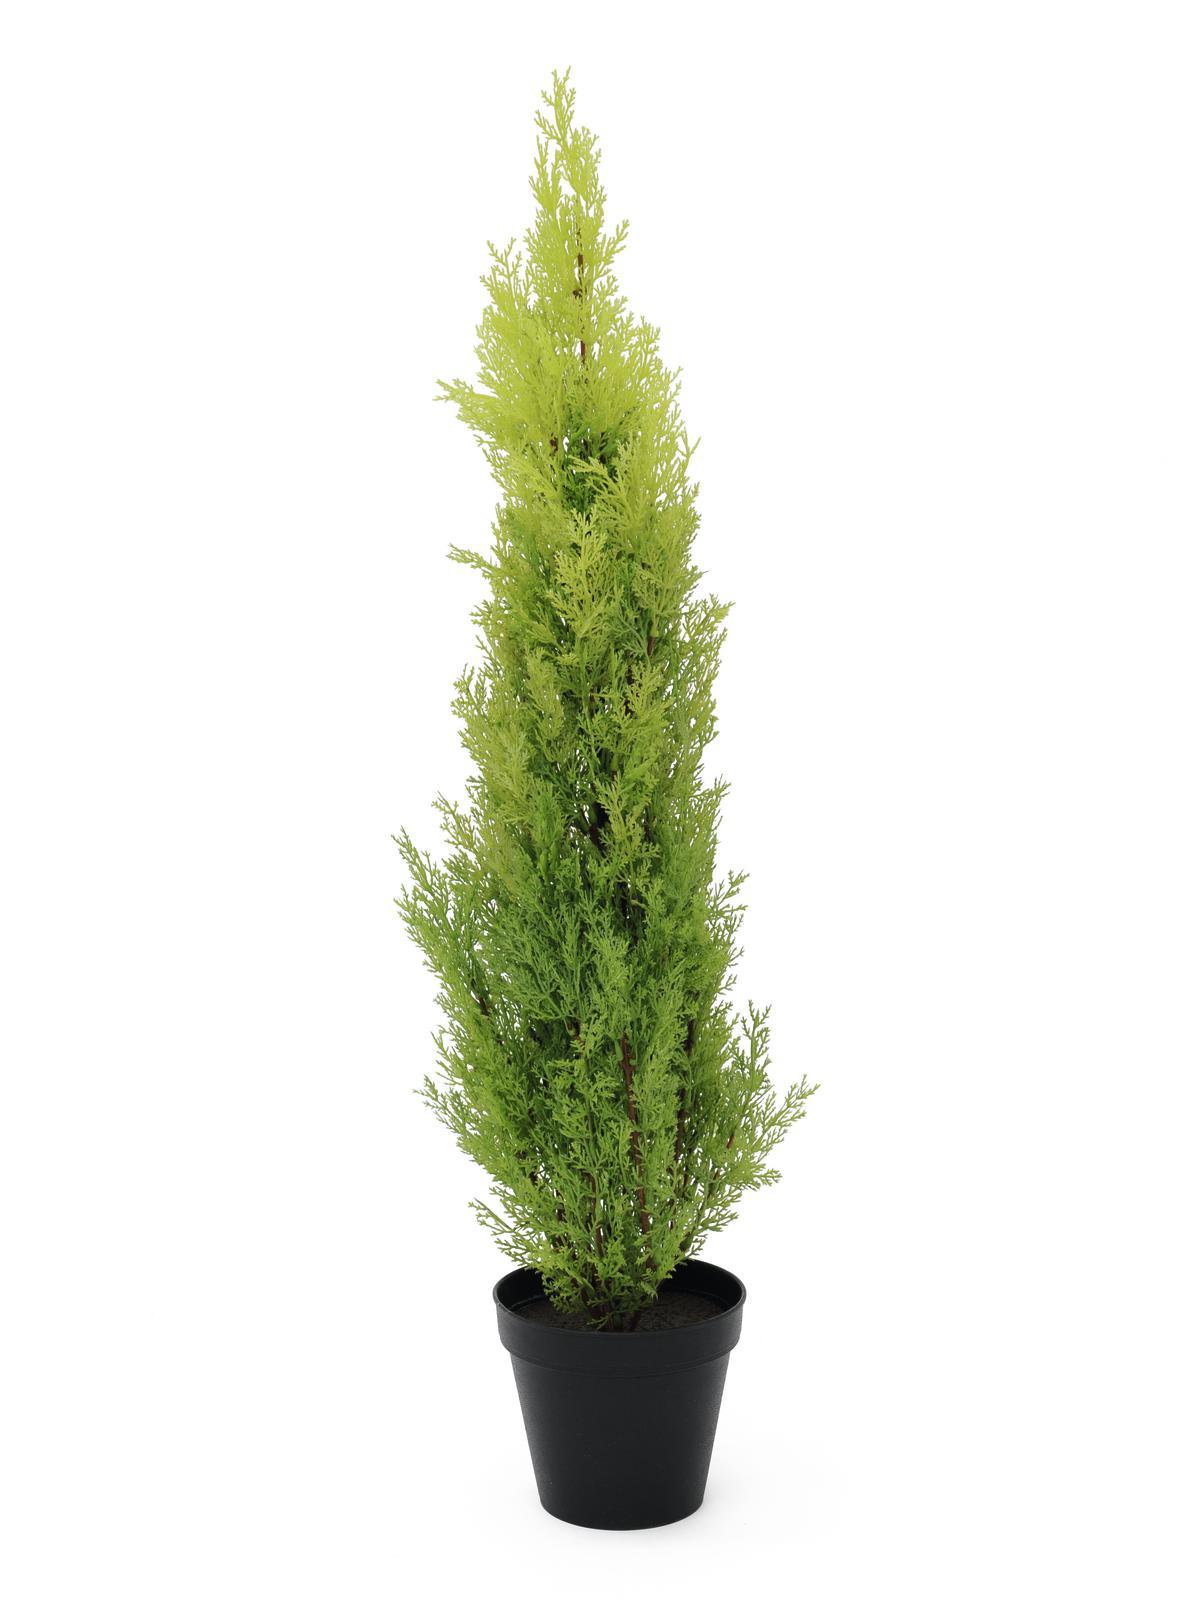 europalms-zypresse-leyland-90cm-kunststoffpflanze